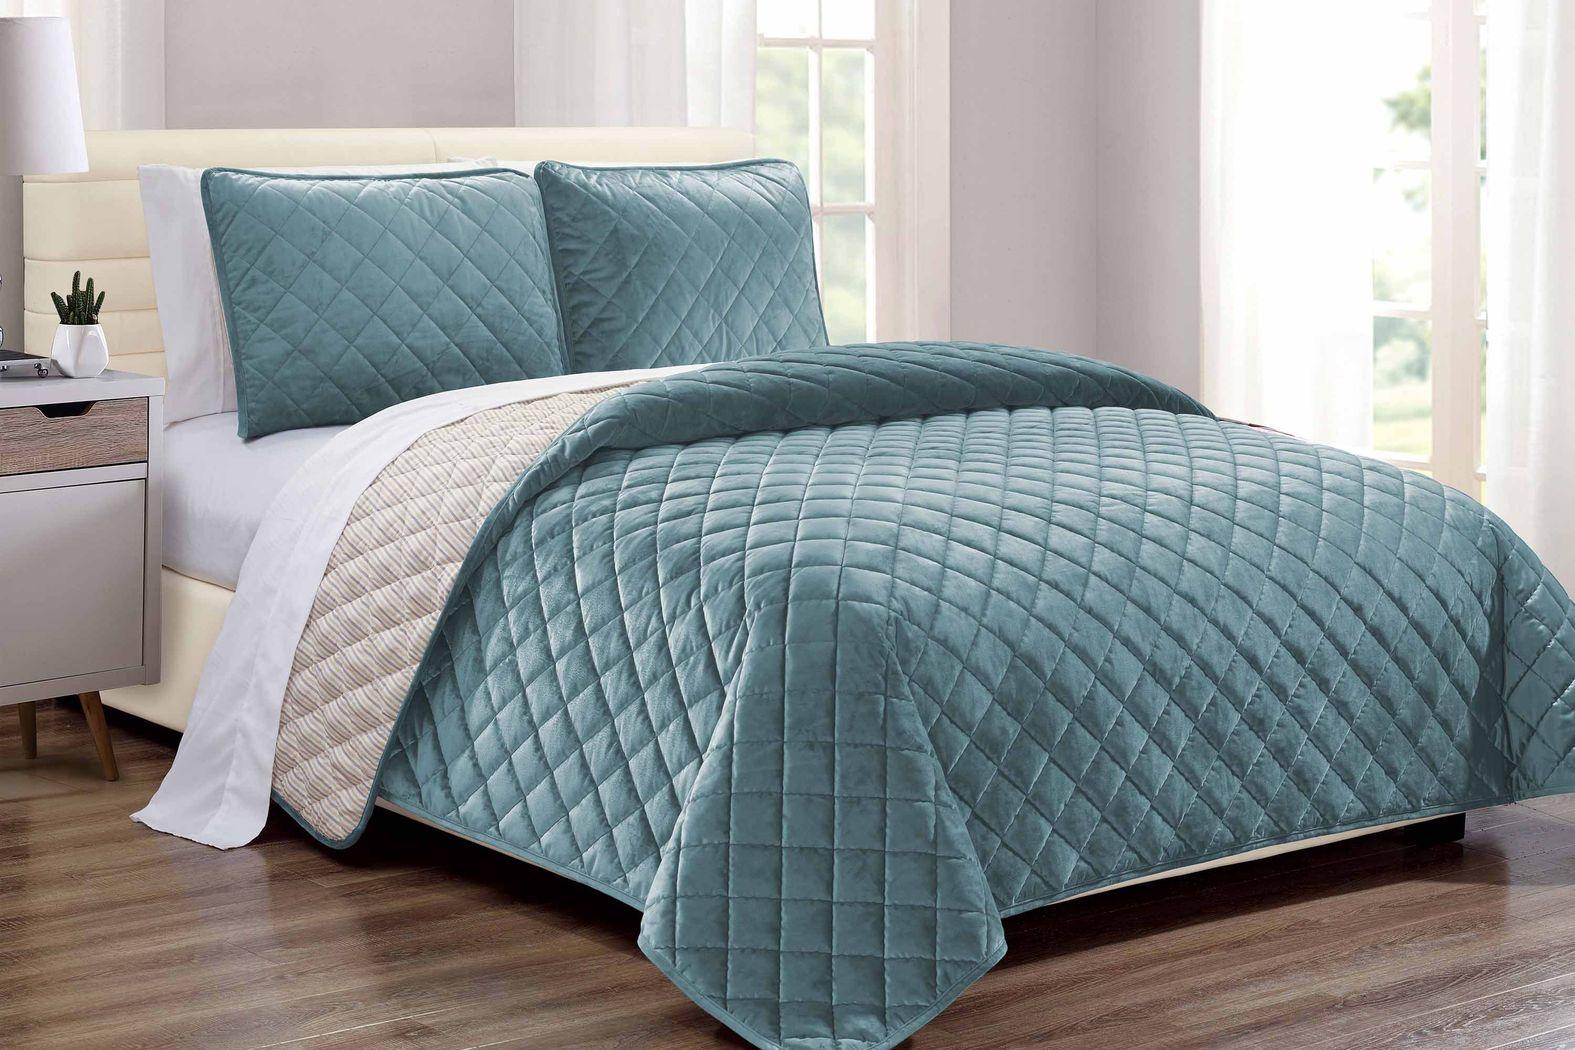 Kids Earthy Tones Teal 2 Pc Twin Comforter Set